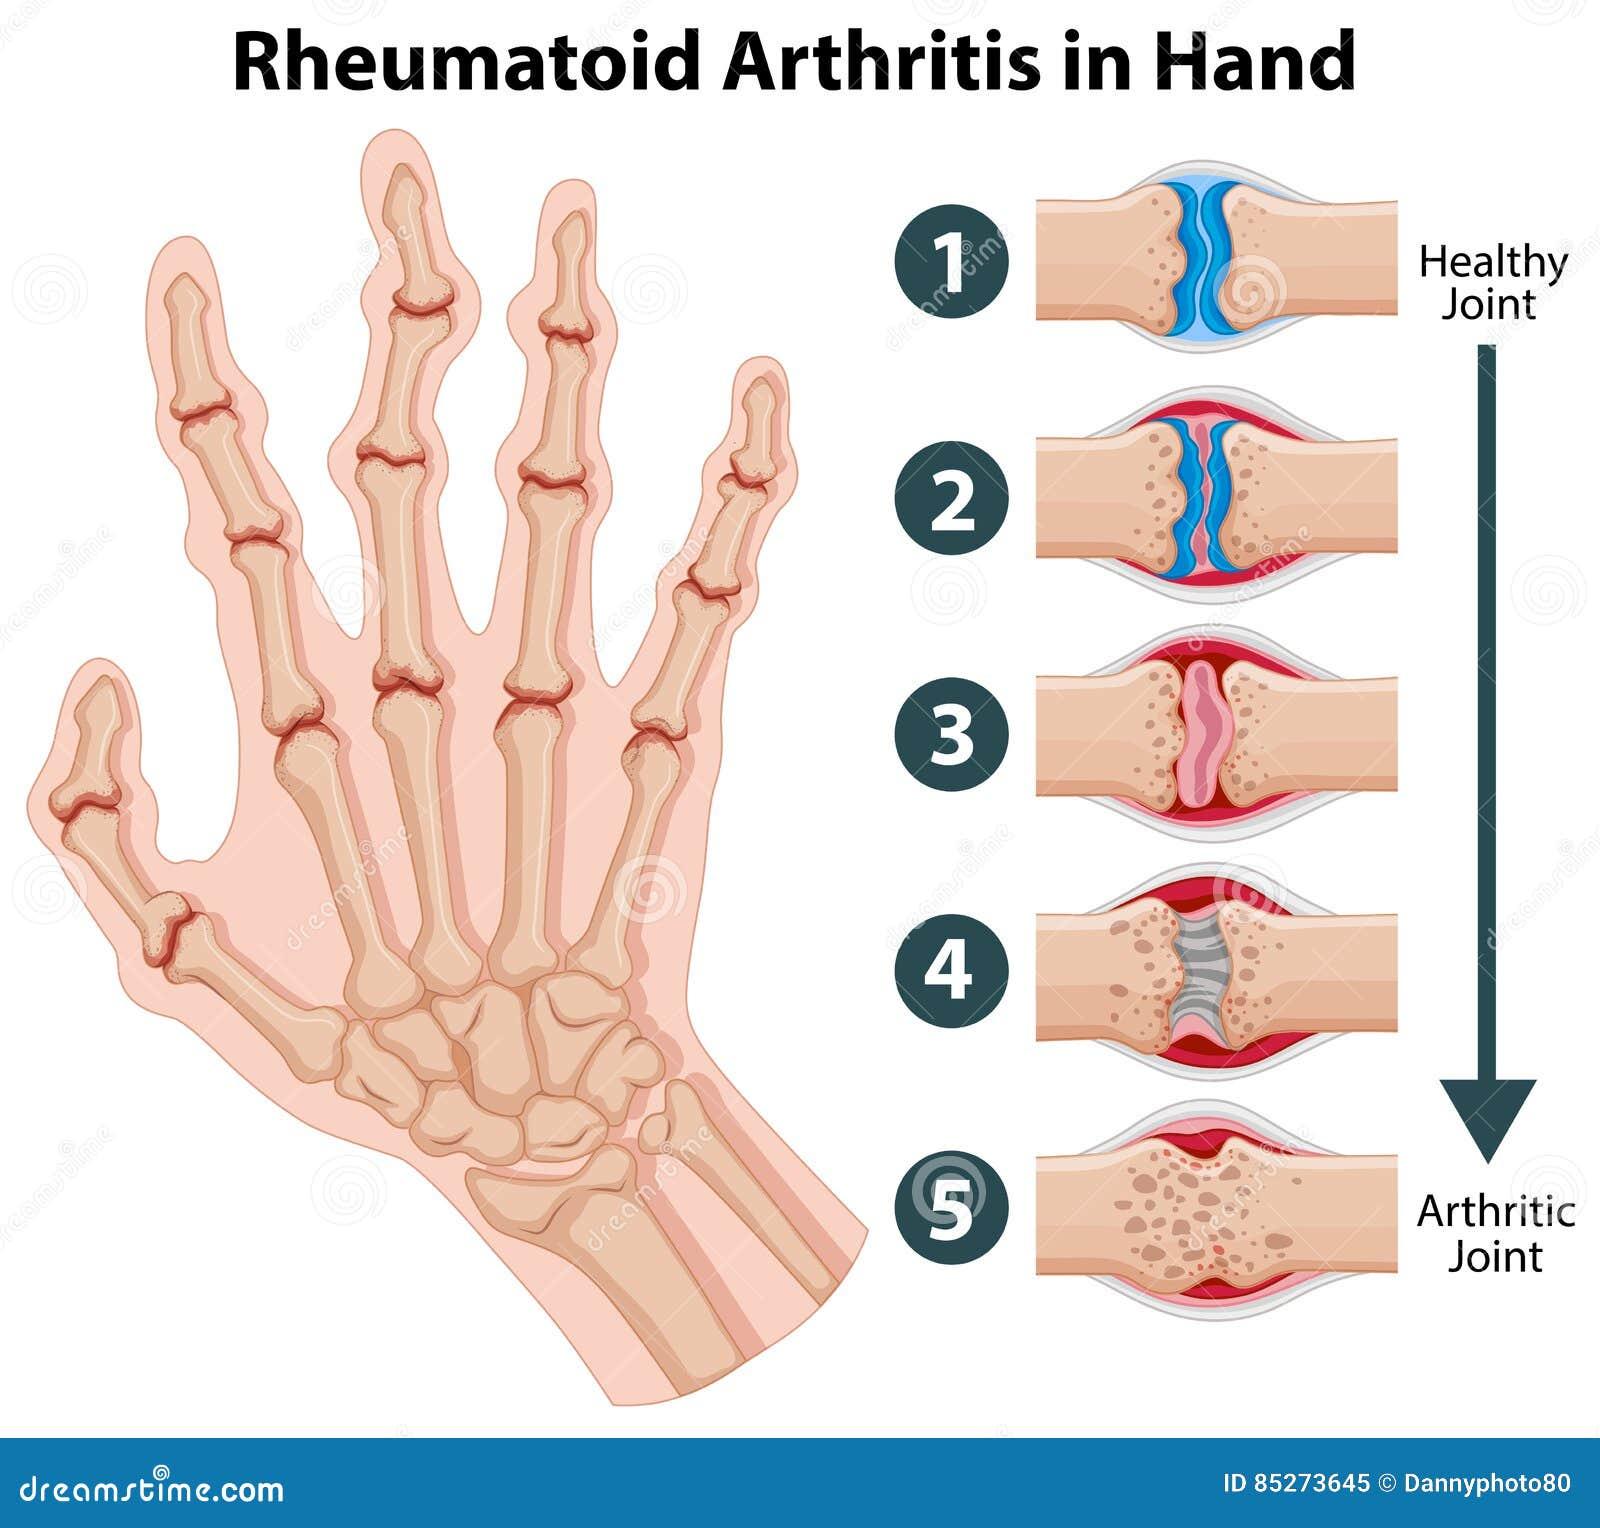 Diagram showing rheumatoid arthriitis in hand